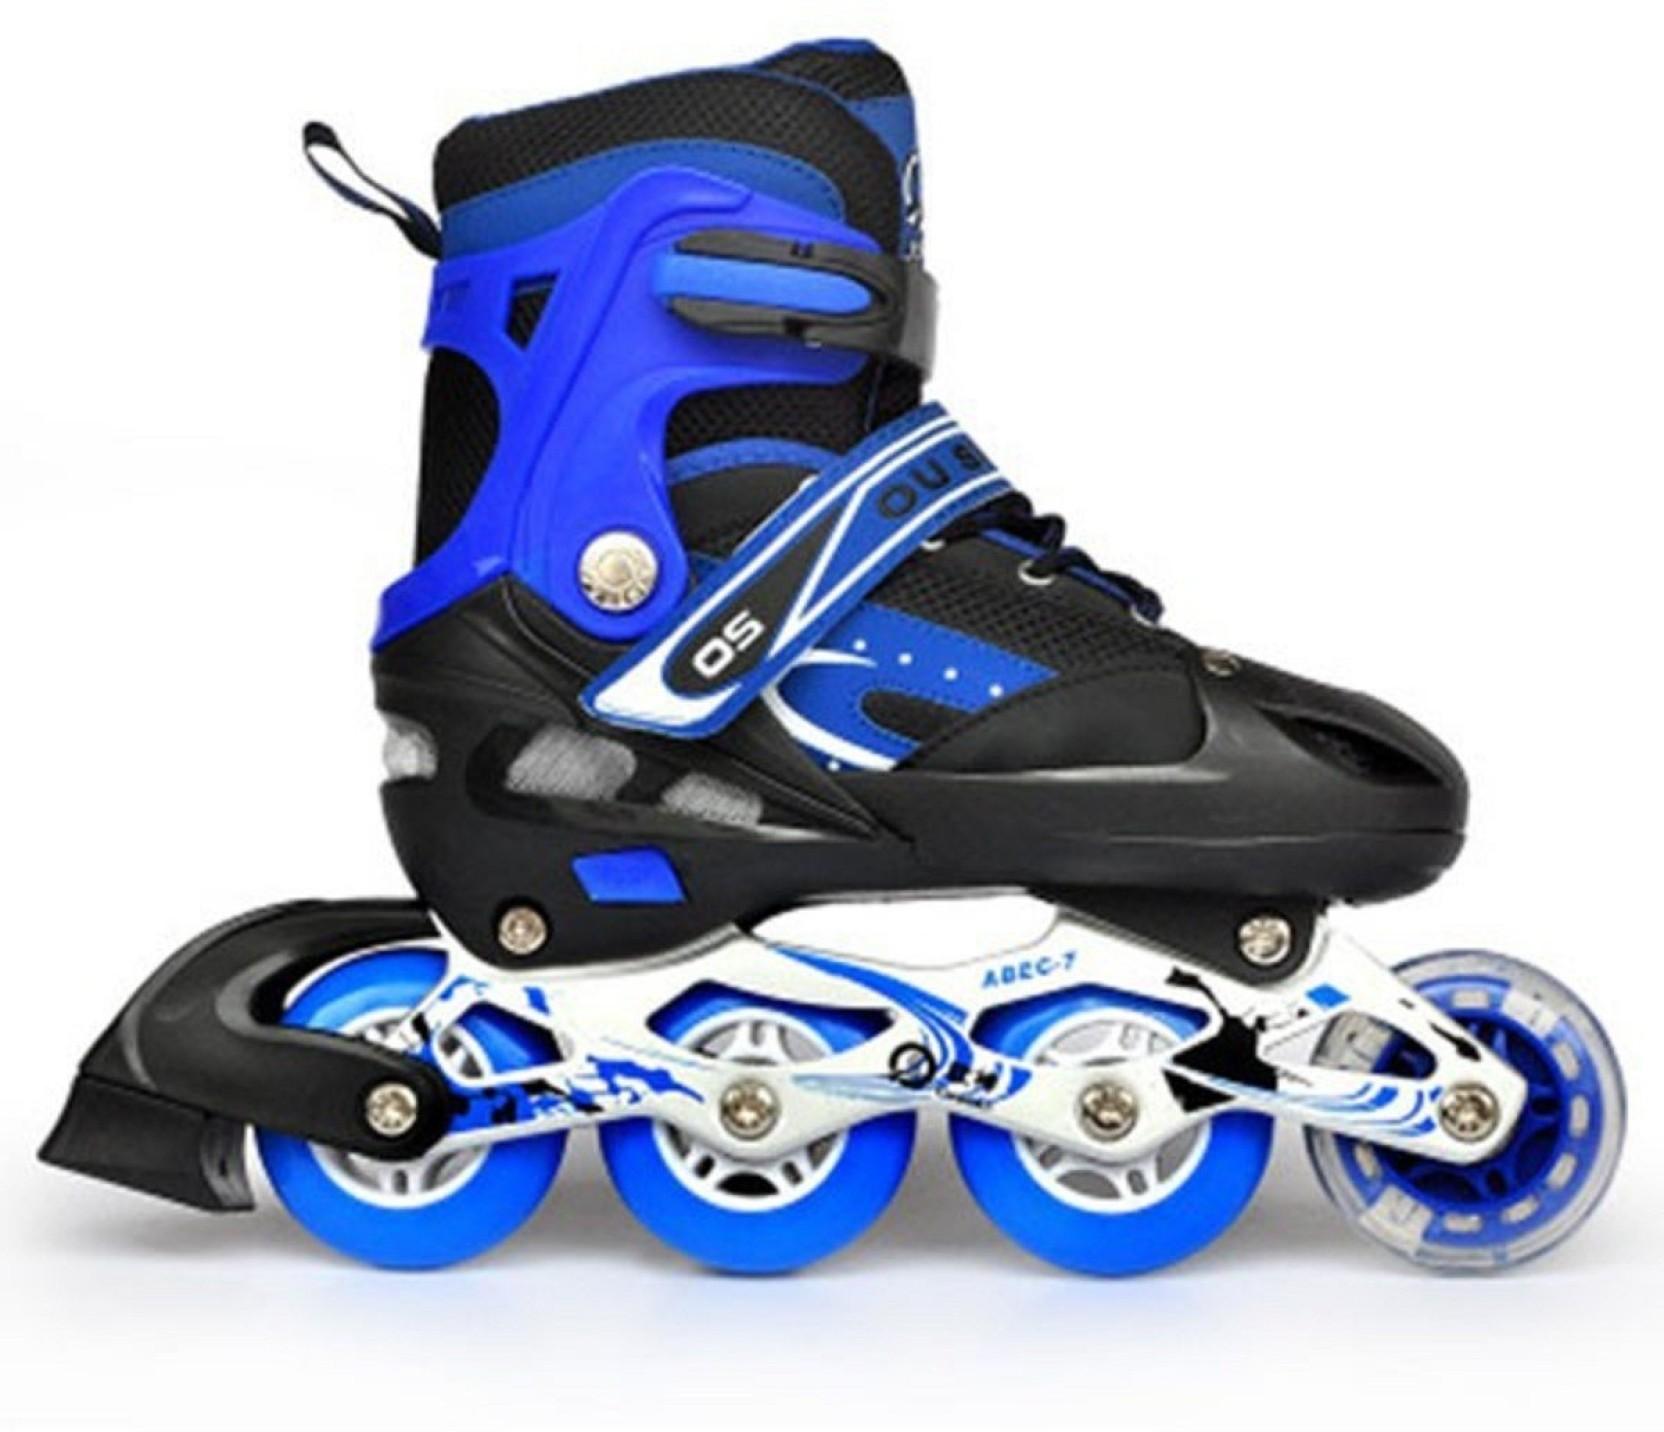 6eb515b42bf Emob Professional Inline four wheels Skating Sneaker Shoes for Kids ...